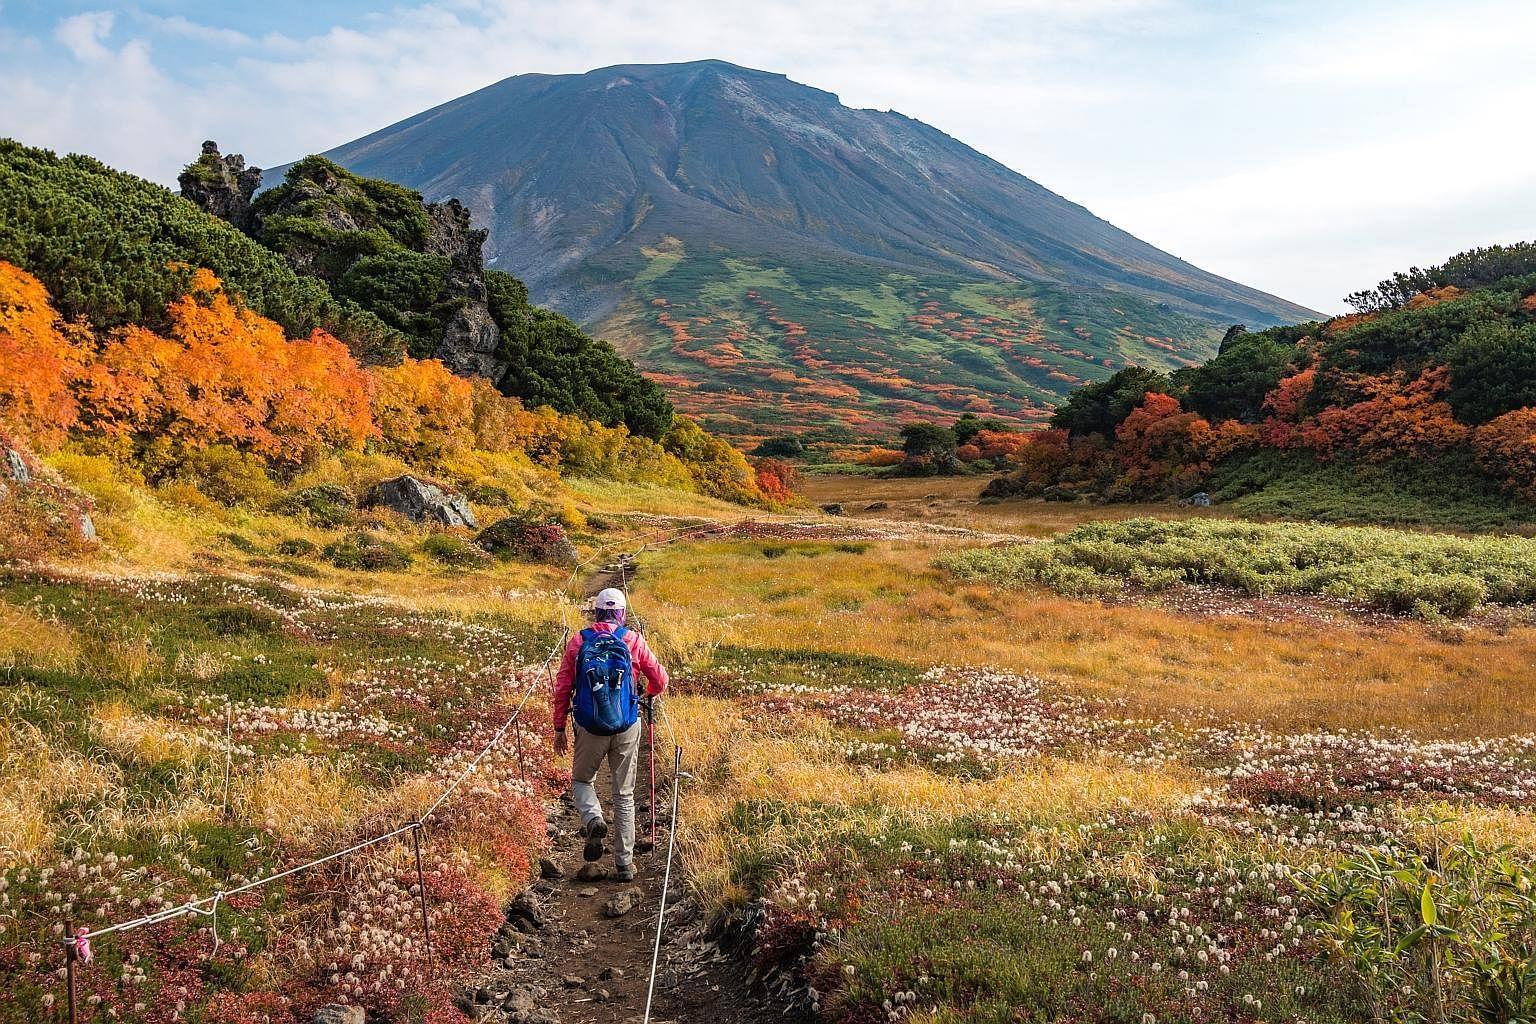 Hike among autumn colours on the trail towards Mount Asahi-dake in Daisetsuzan National Park.